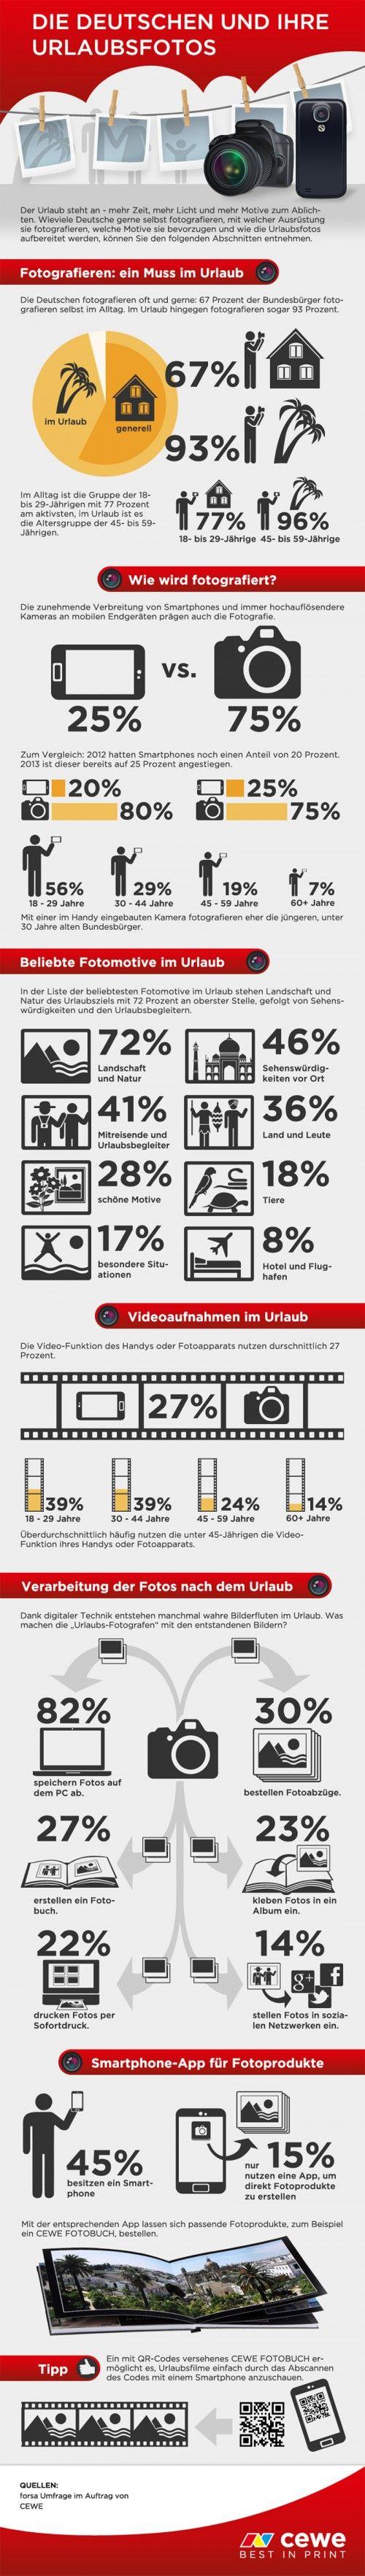 22 best Sommer, Sonne, Urlaub images on Pinterest | Sun, Vacation ...